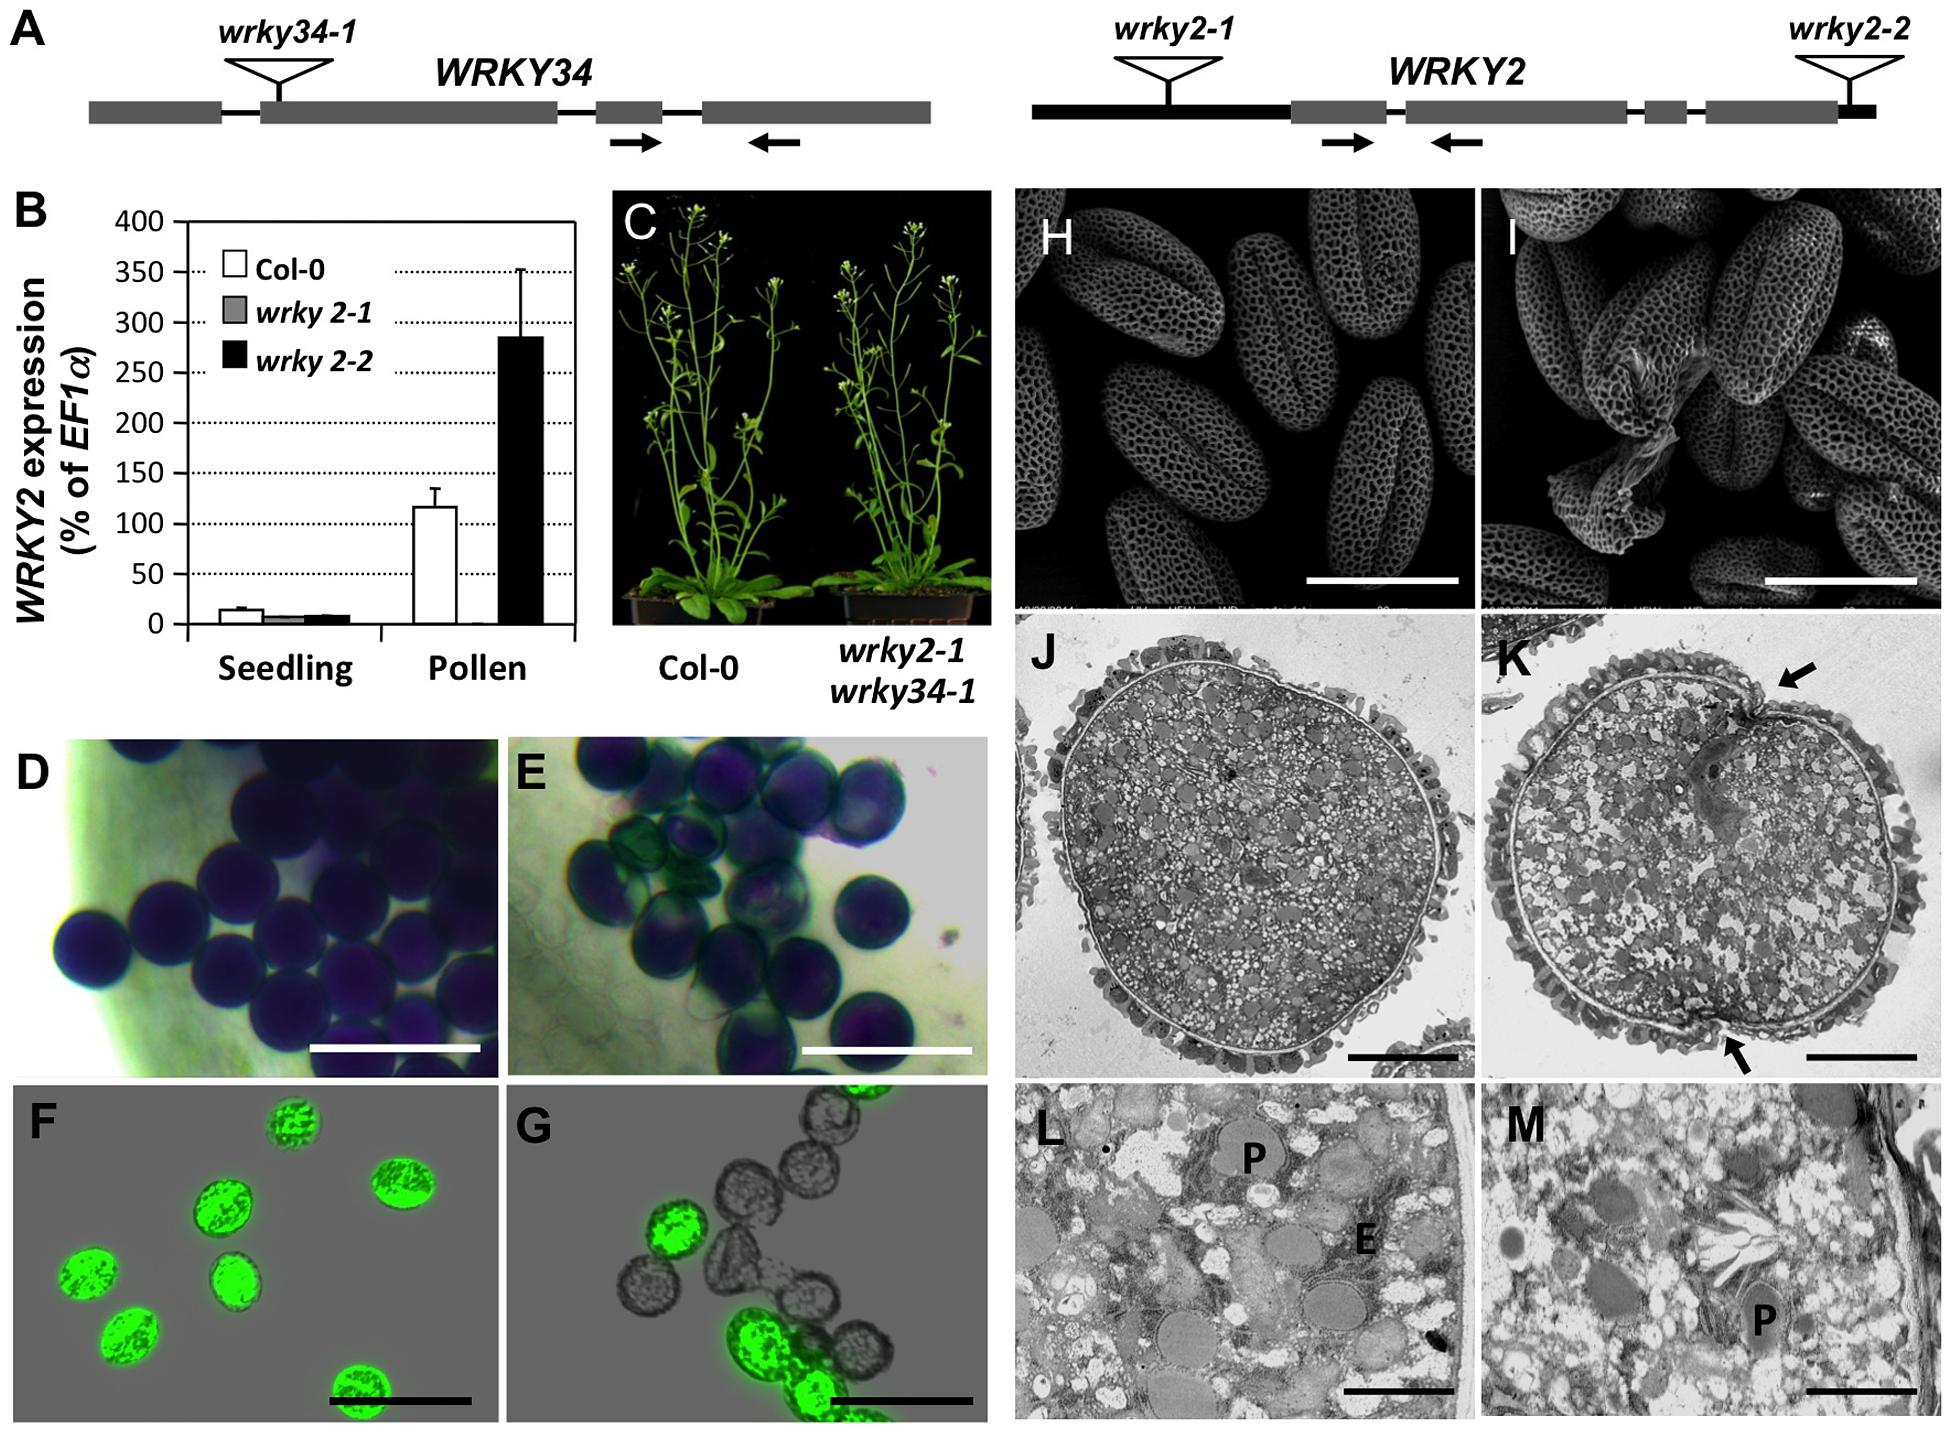 Phenotype of <i>wrky2-1 wrky34-1</i> double mutant pollen.